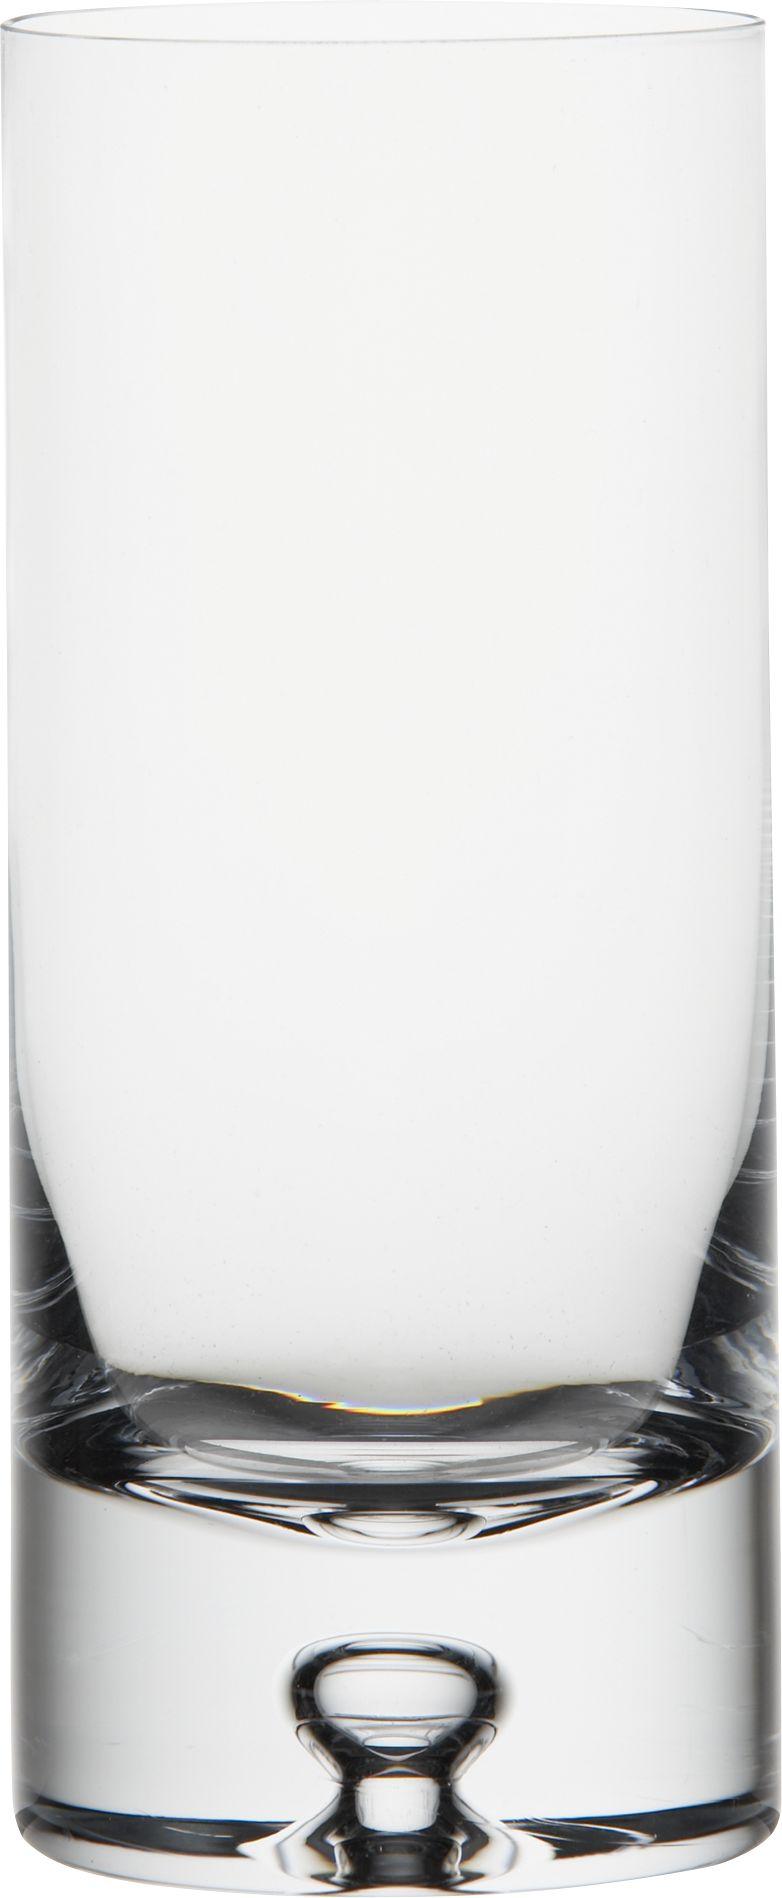 Our most popular barware collection. Sleek, cylindrical shape with a signature open bubble in the hefty sham base.<br /><br /><NEWTAG/><ul><li>Handmade</li><li>Exceptionally clear glass</li><li>Cut and polished rim</li><li>Dishwasher-safe</li><li>Made in Poland</li></ul>